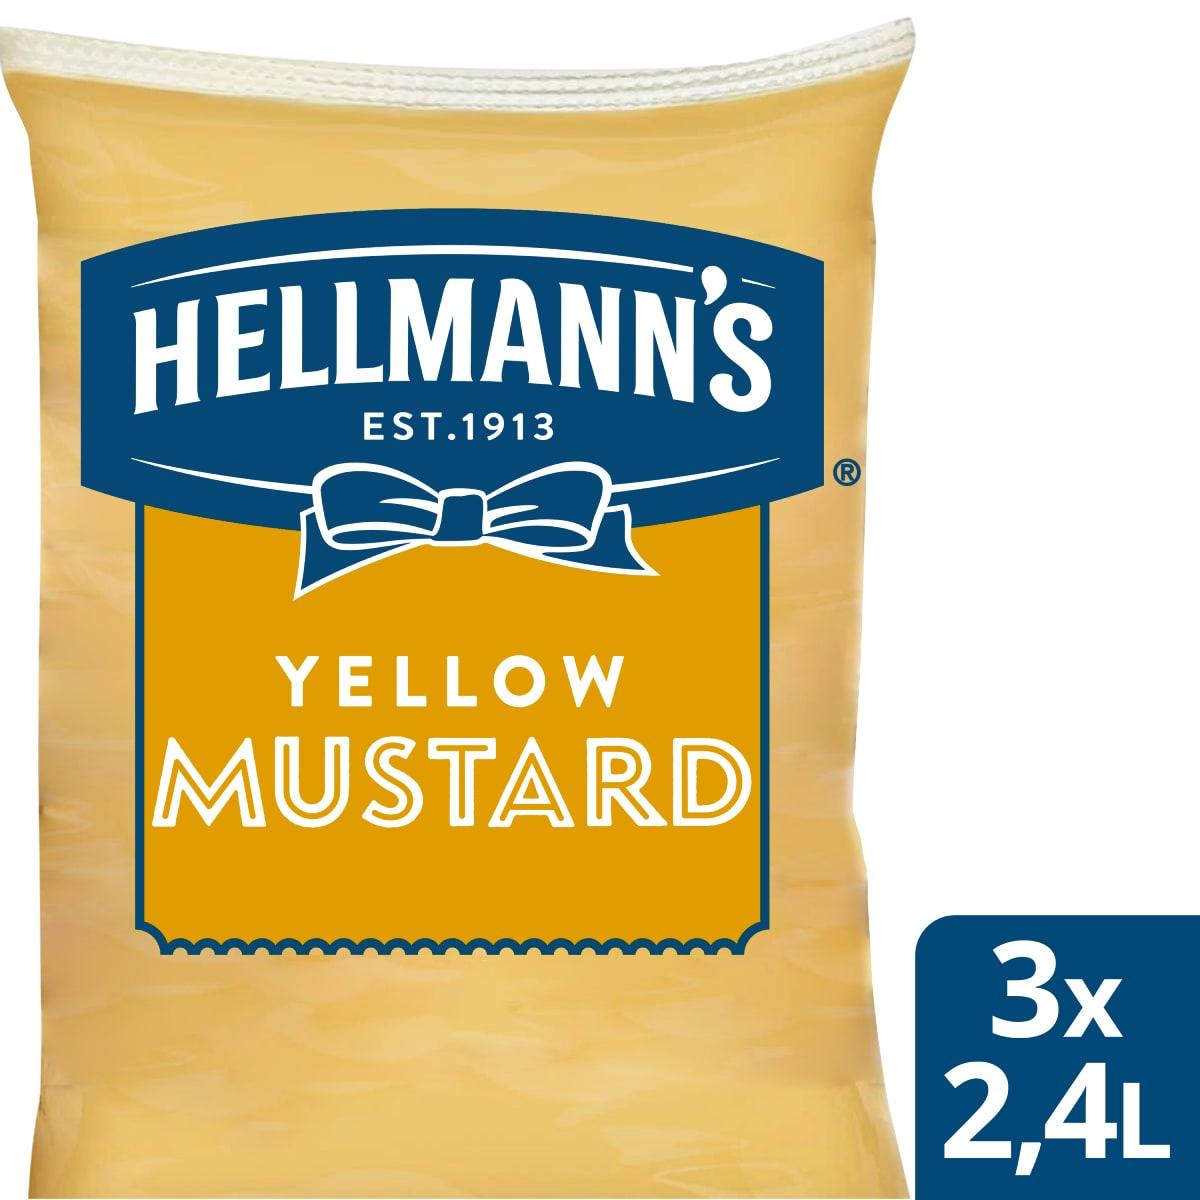 Hellmann's Горчица пауч 2.4 l - Hellmann's дресинг паучове за лесно и ефикасно дозиране